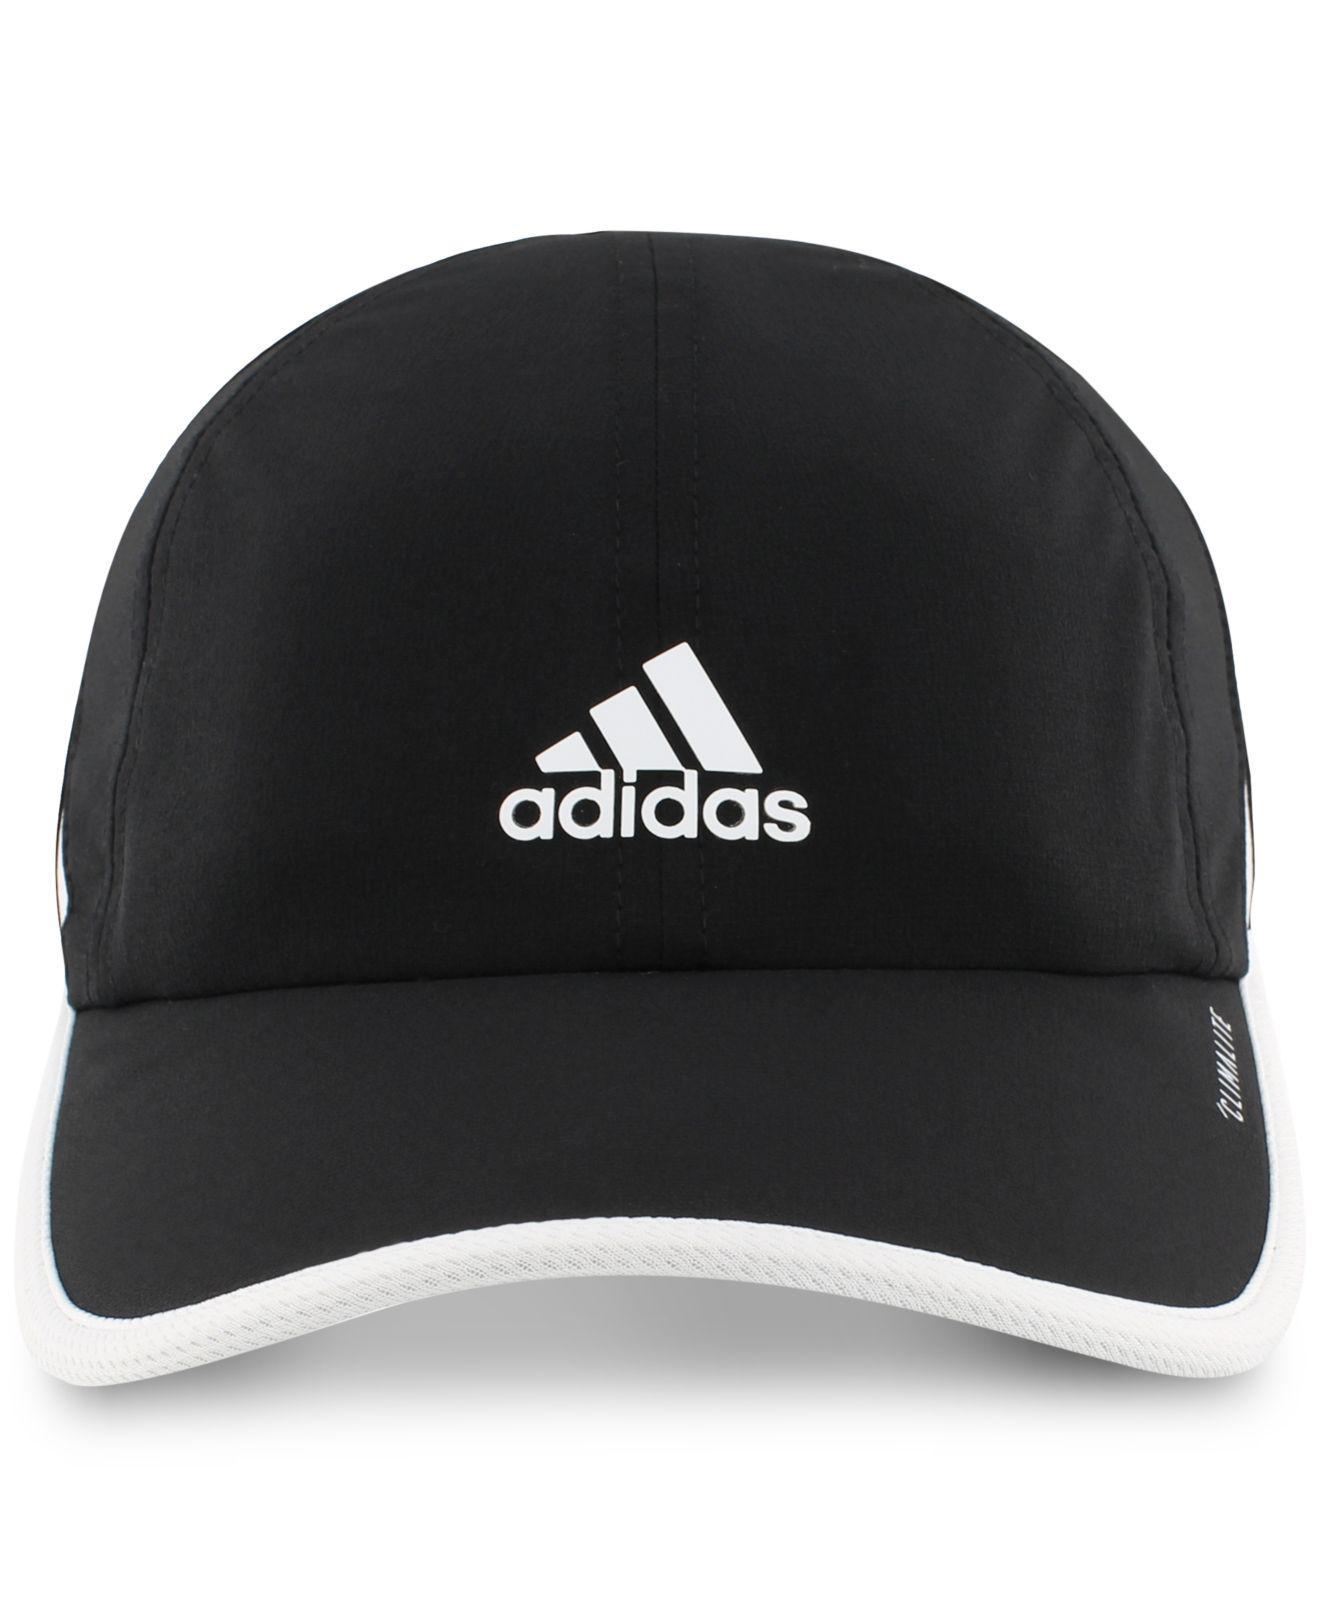 41dd99595dc Adidas - Black Superlite Cap - Lyst. View fullscreen